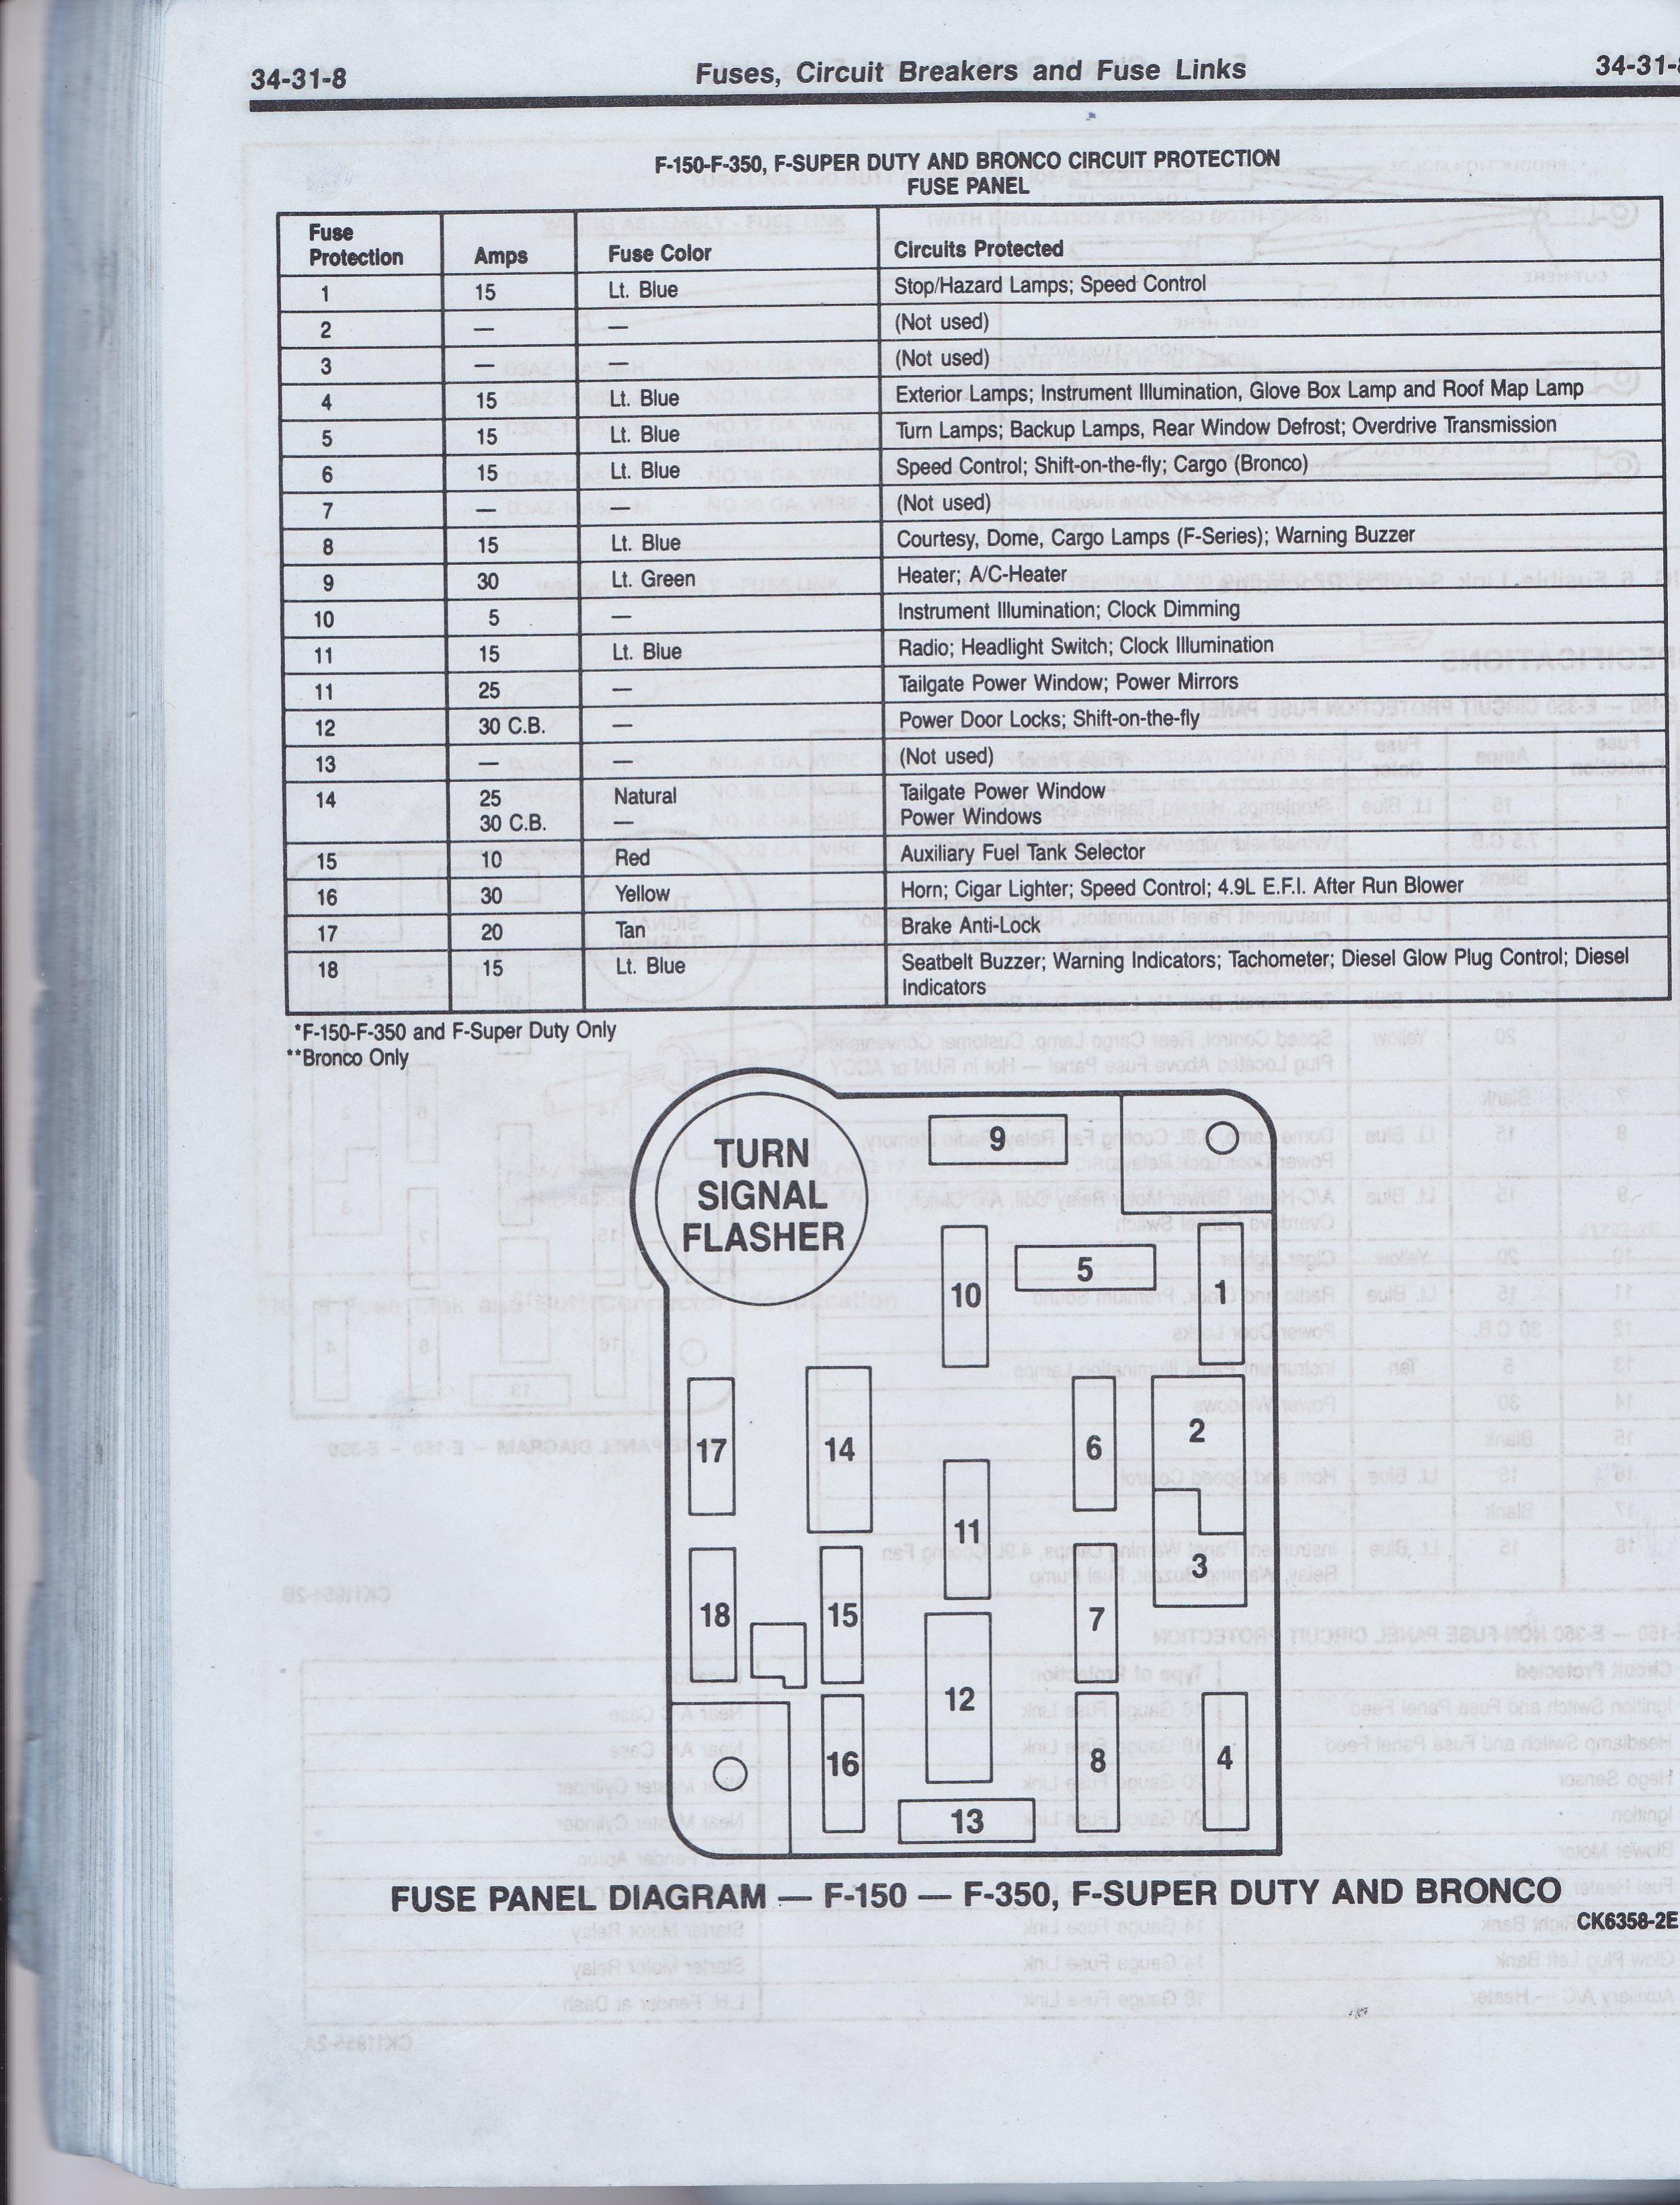 112802d1500678921-89-f350-coolant-temperature-sensor-89-fuse-panel  F Fuse Box on 89 f350 clutch master cylinder, 89 f350 starter, 89 f350 steering column,